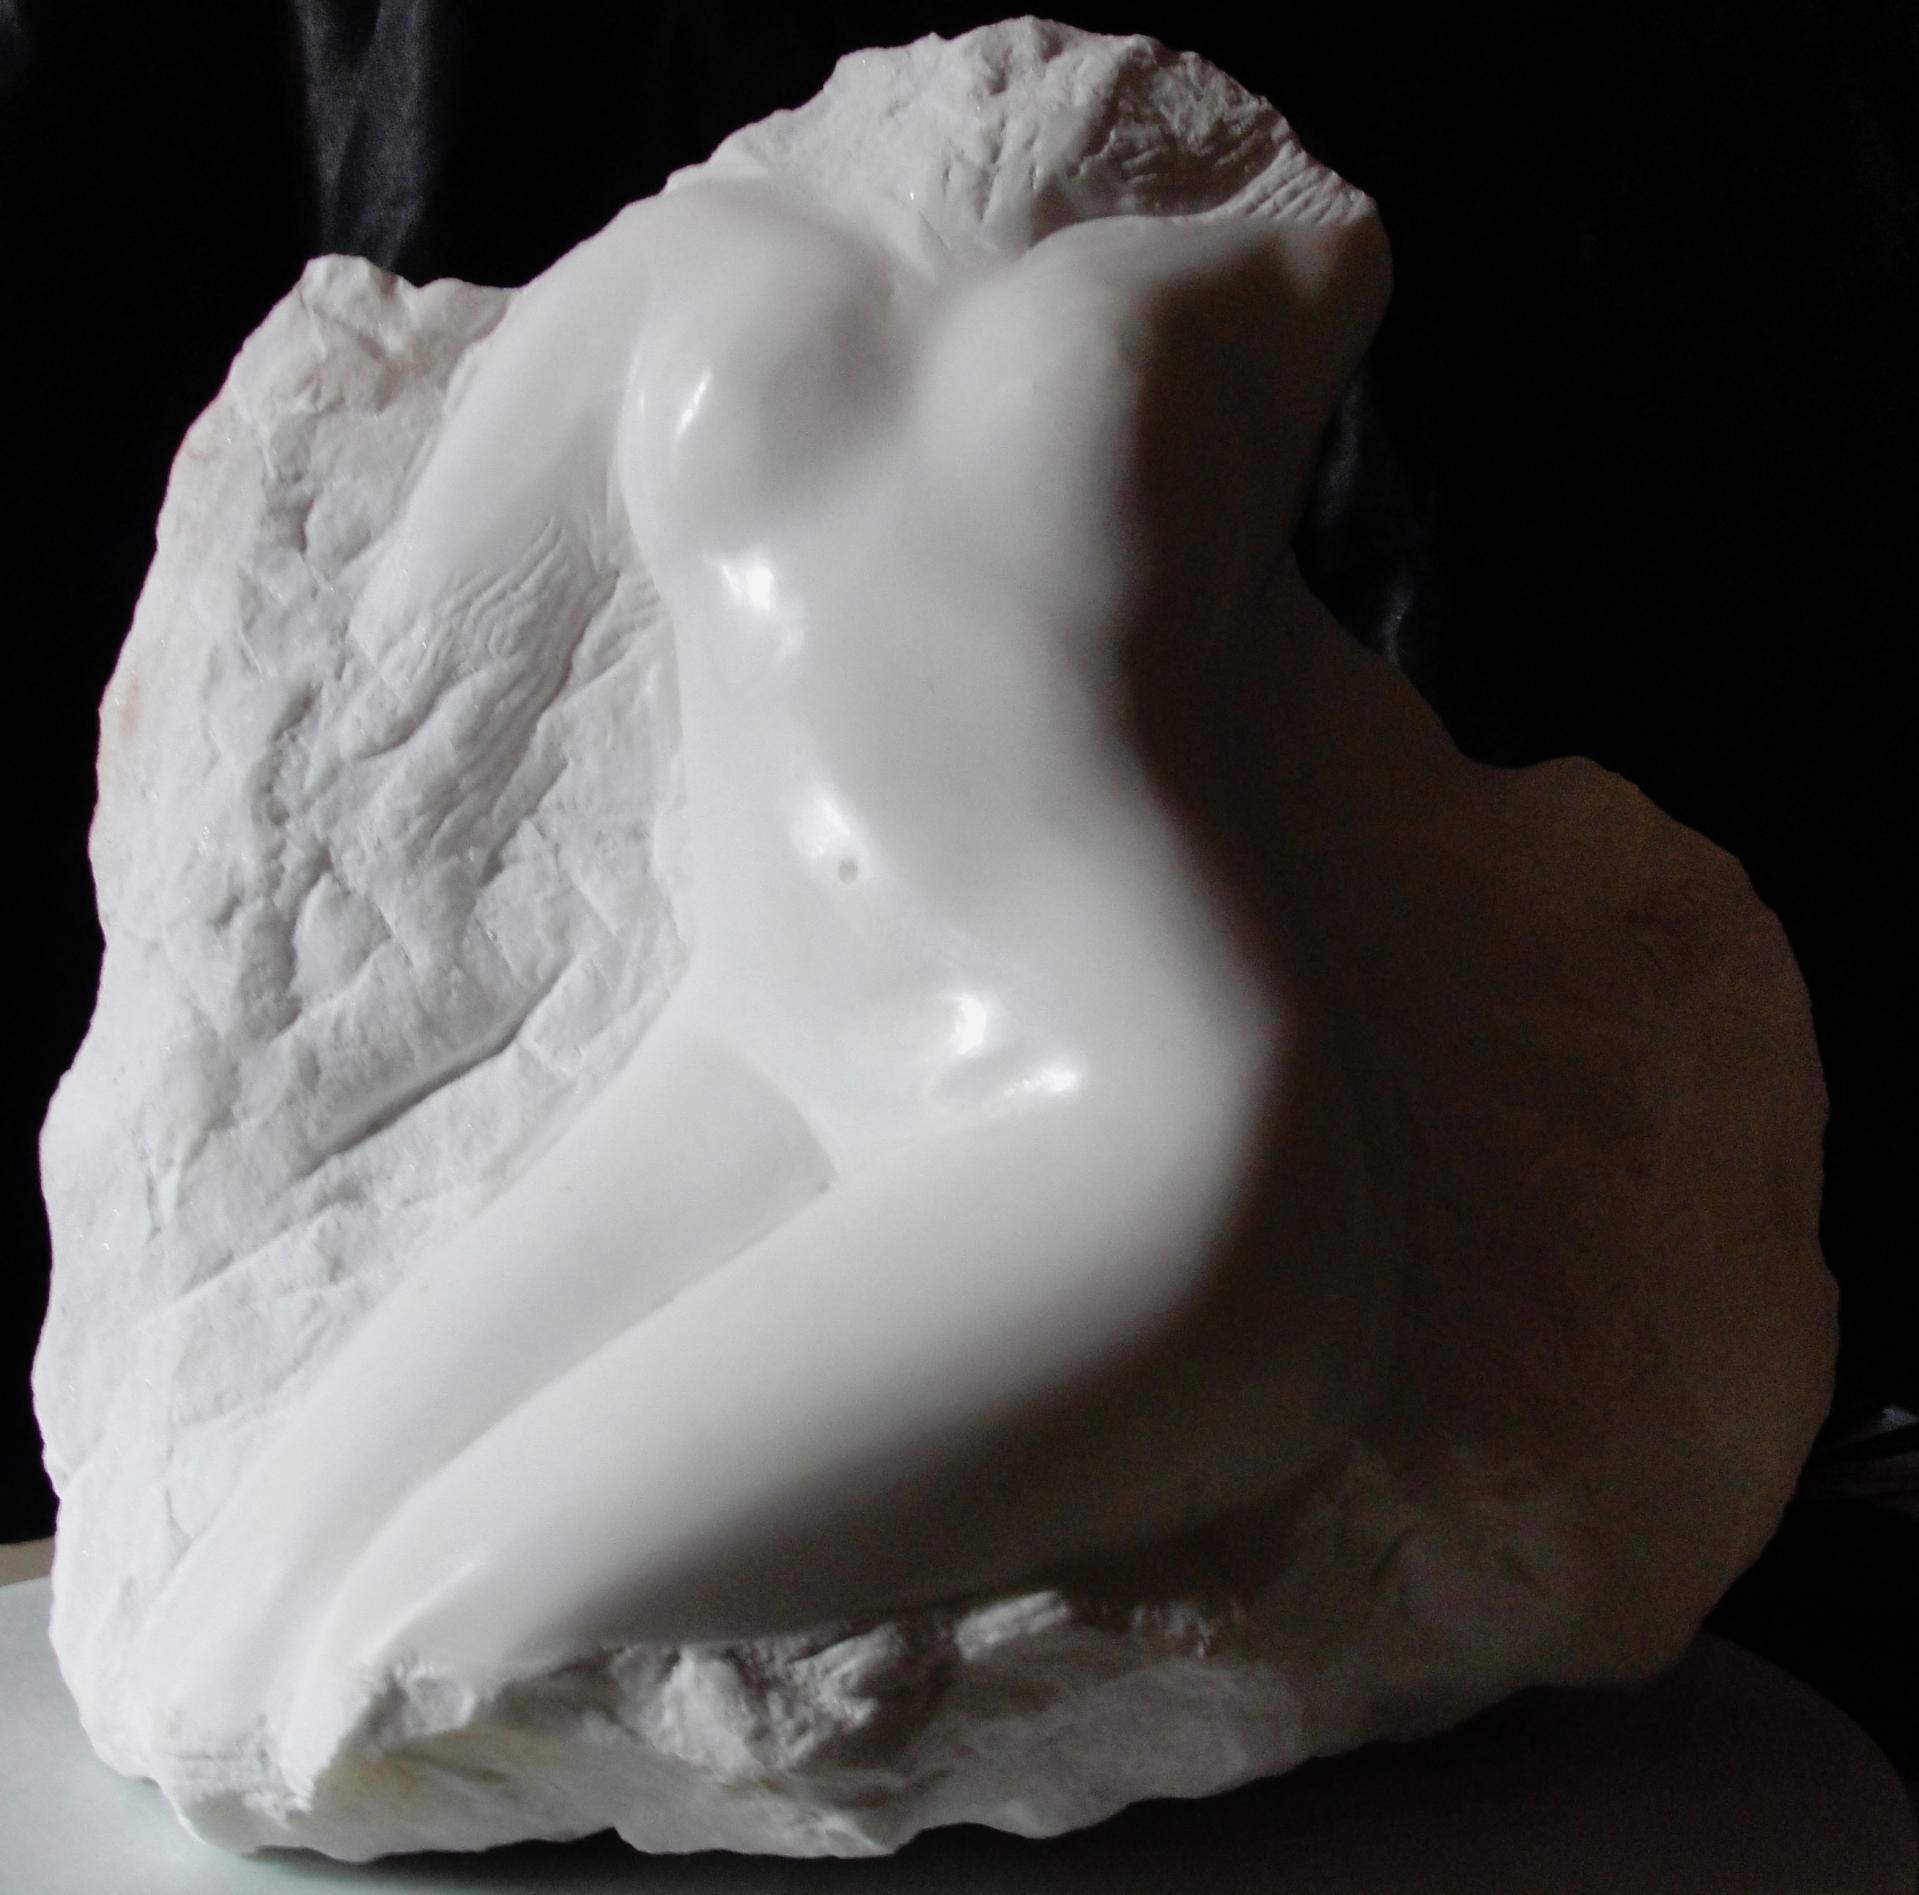 Eveil sculpture d un nu feminin en marbre 40cm relief de jean joseph chevalier 4